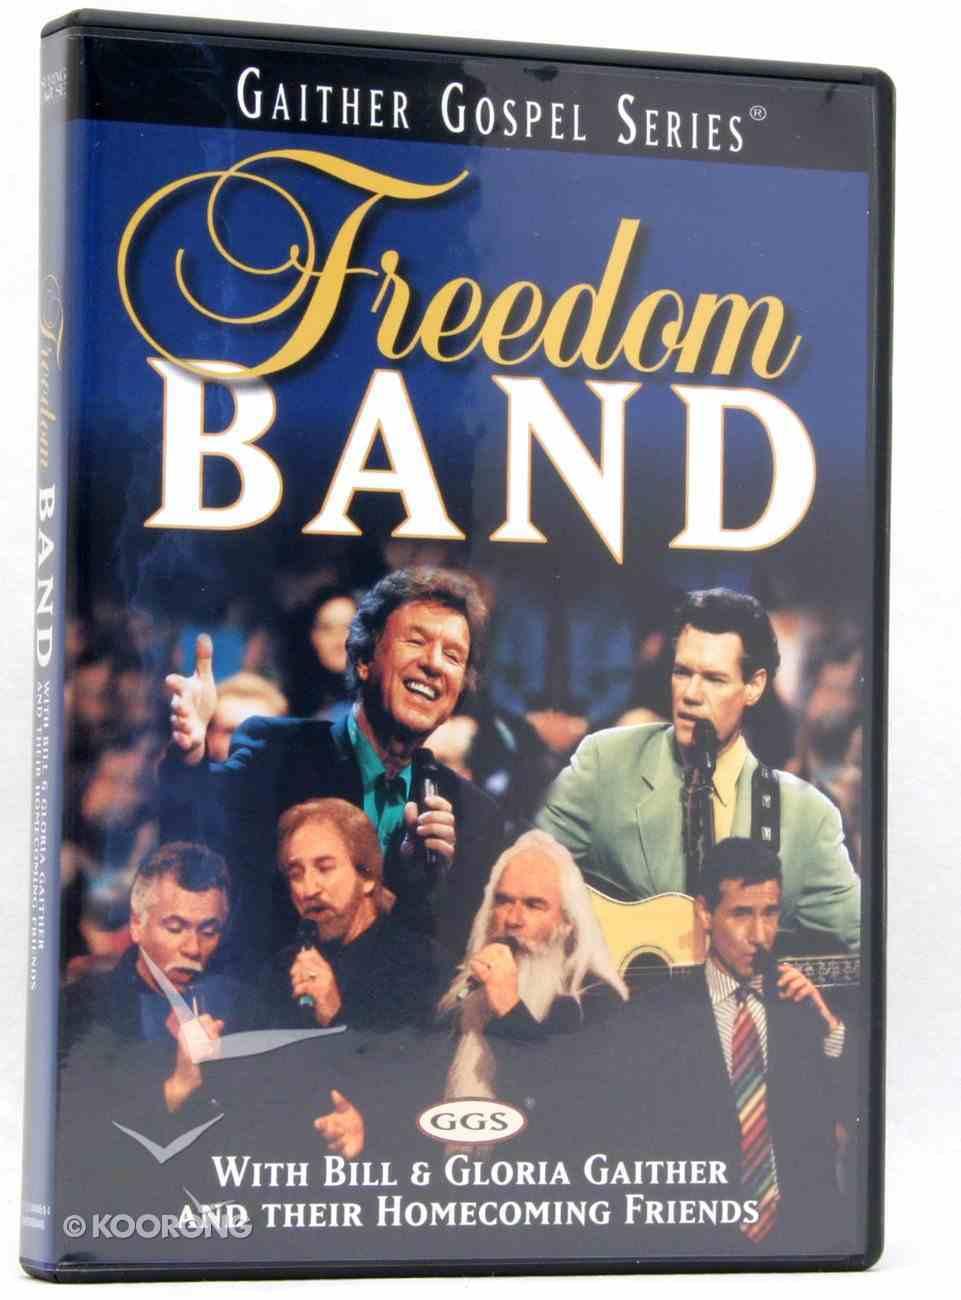 Freedom Band (Gaither Gospel Series) DVD